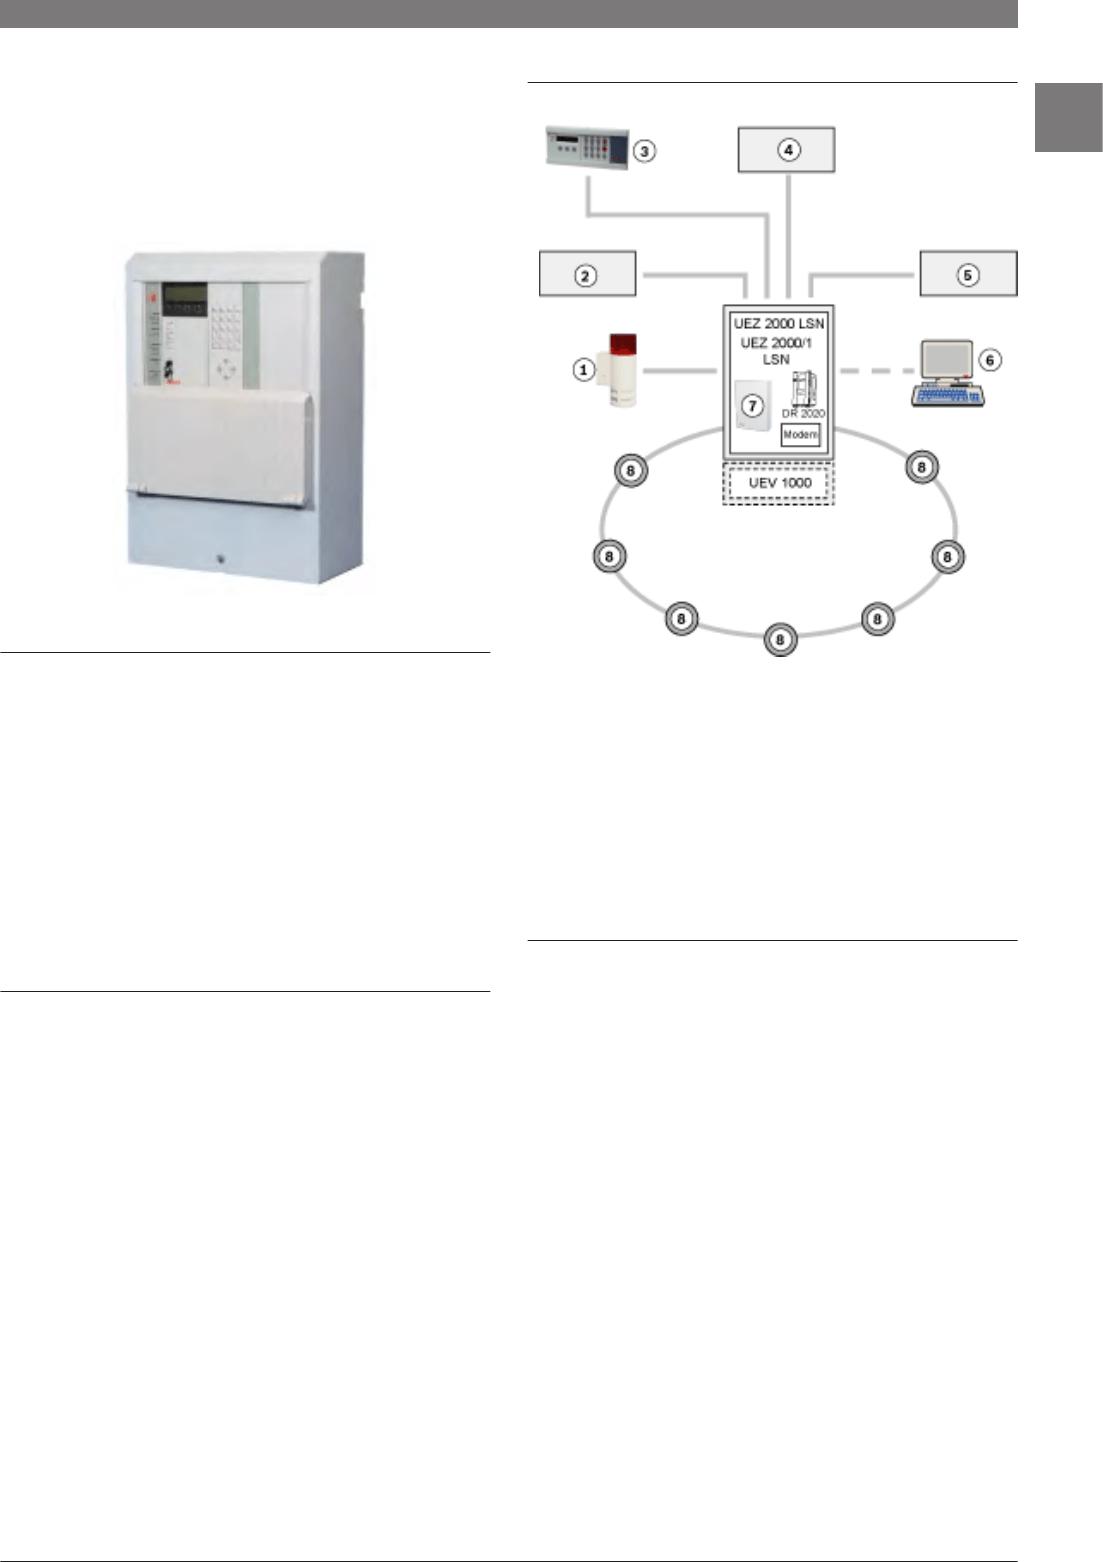 Bosch Appliances 8-Dec UEZ 2000/1 LSN, UEZ 2000 LSN